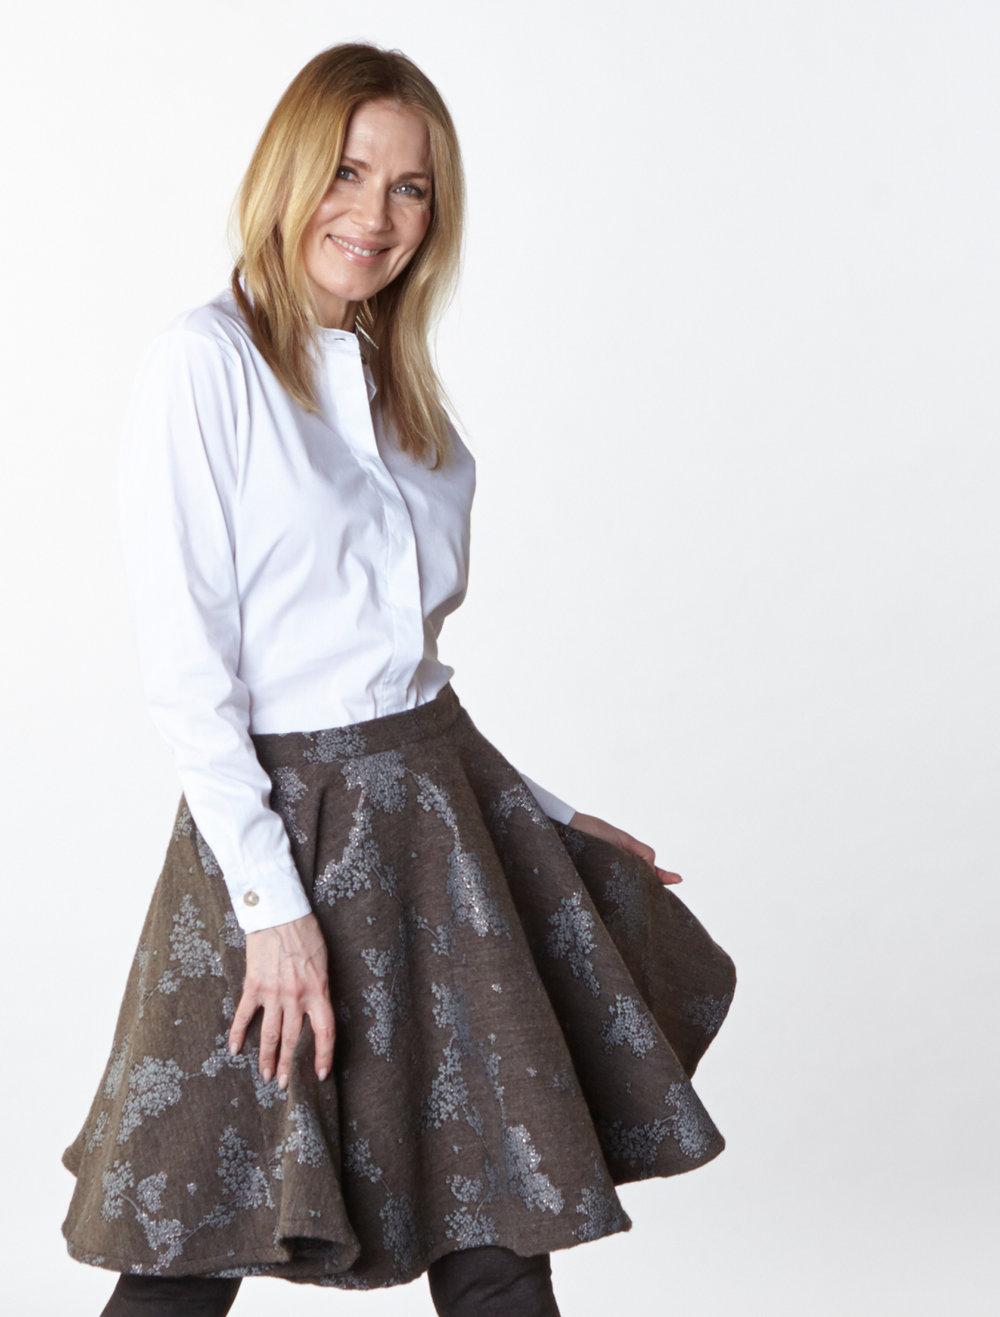 Wilson Shirt in White Stretch Poplin, Dansa Skirt in Taupe/Silver Ready for Bruges, Legging in Chocolate Italian Melange